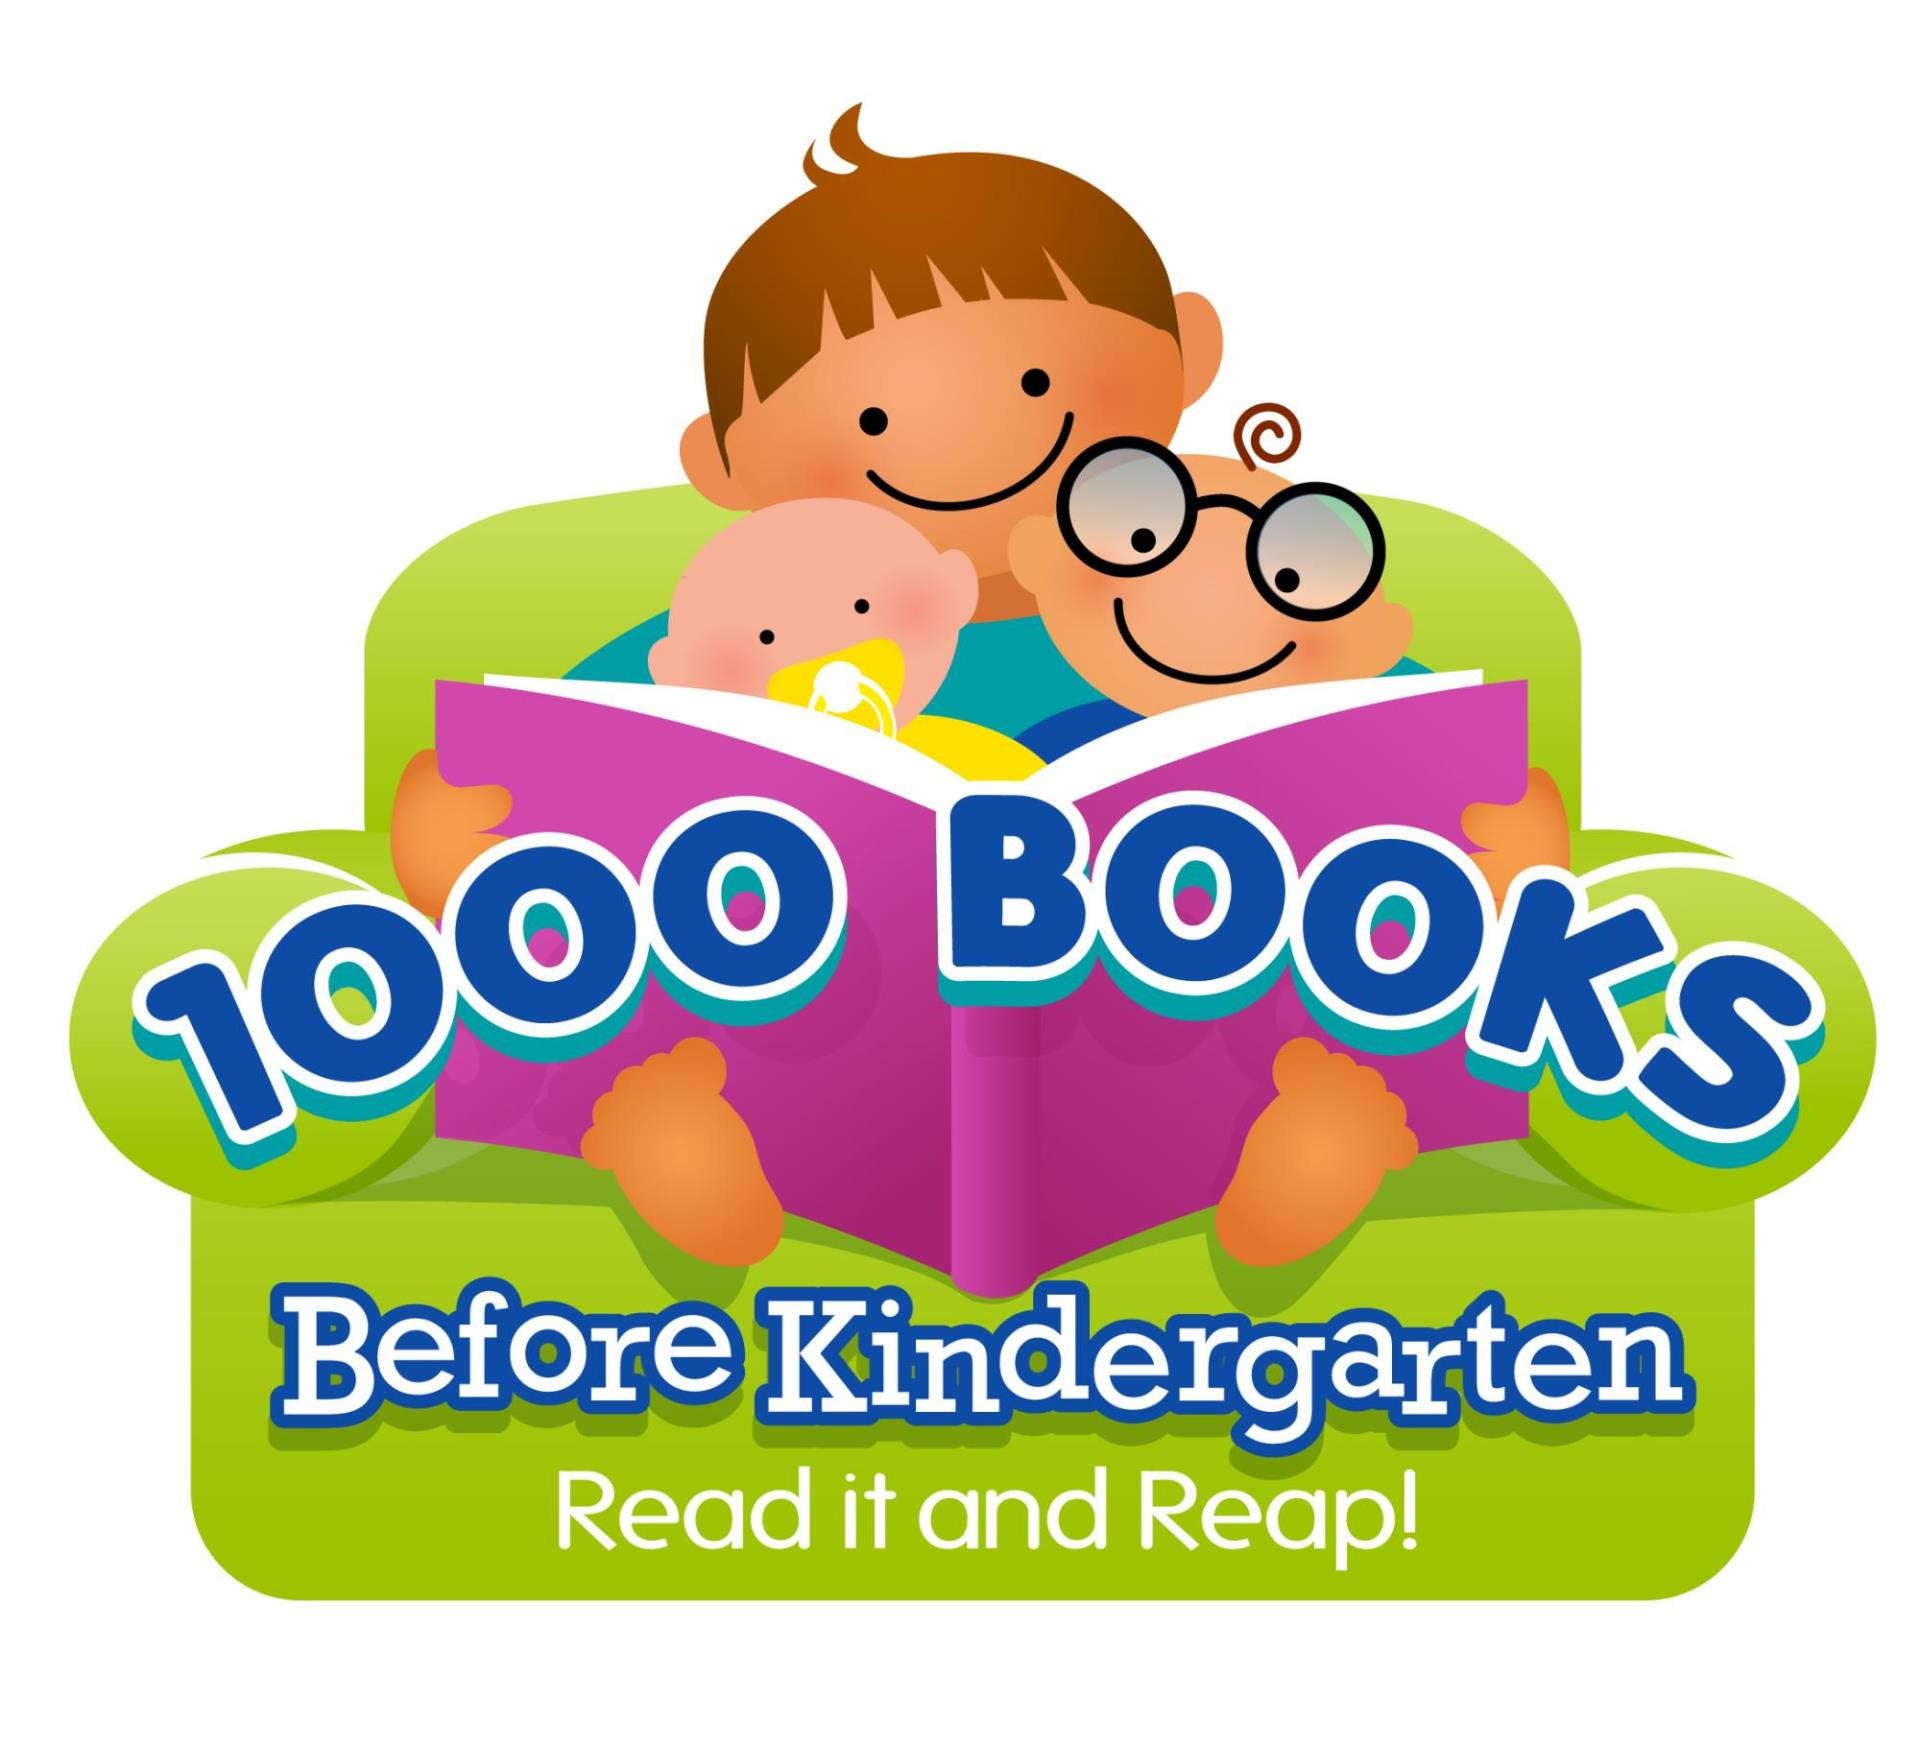 1000 Books green-logo